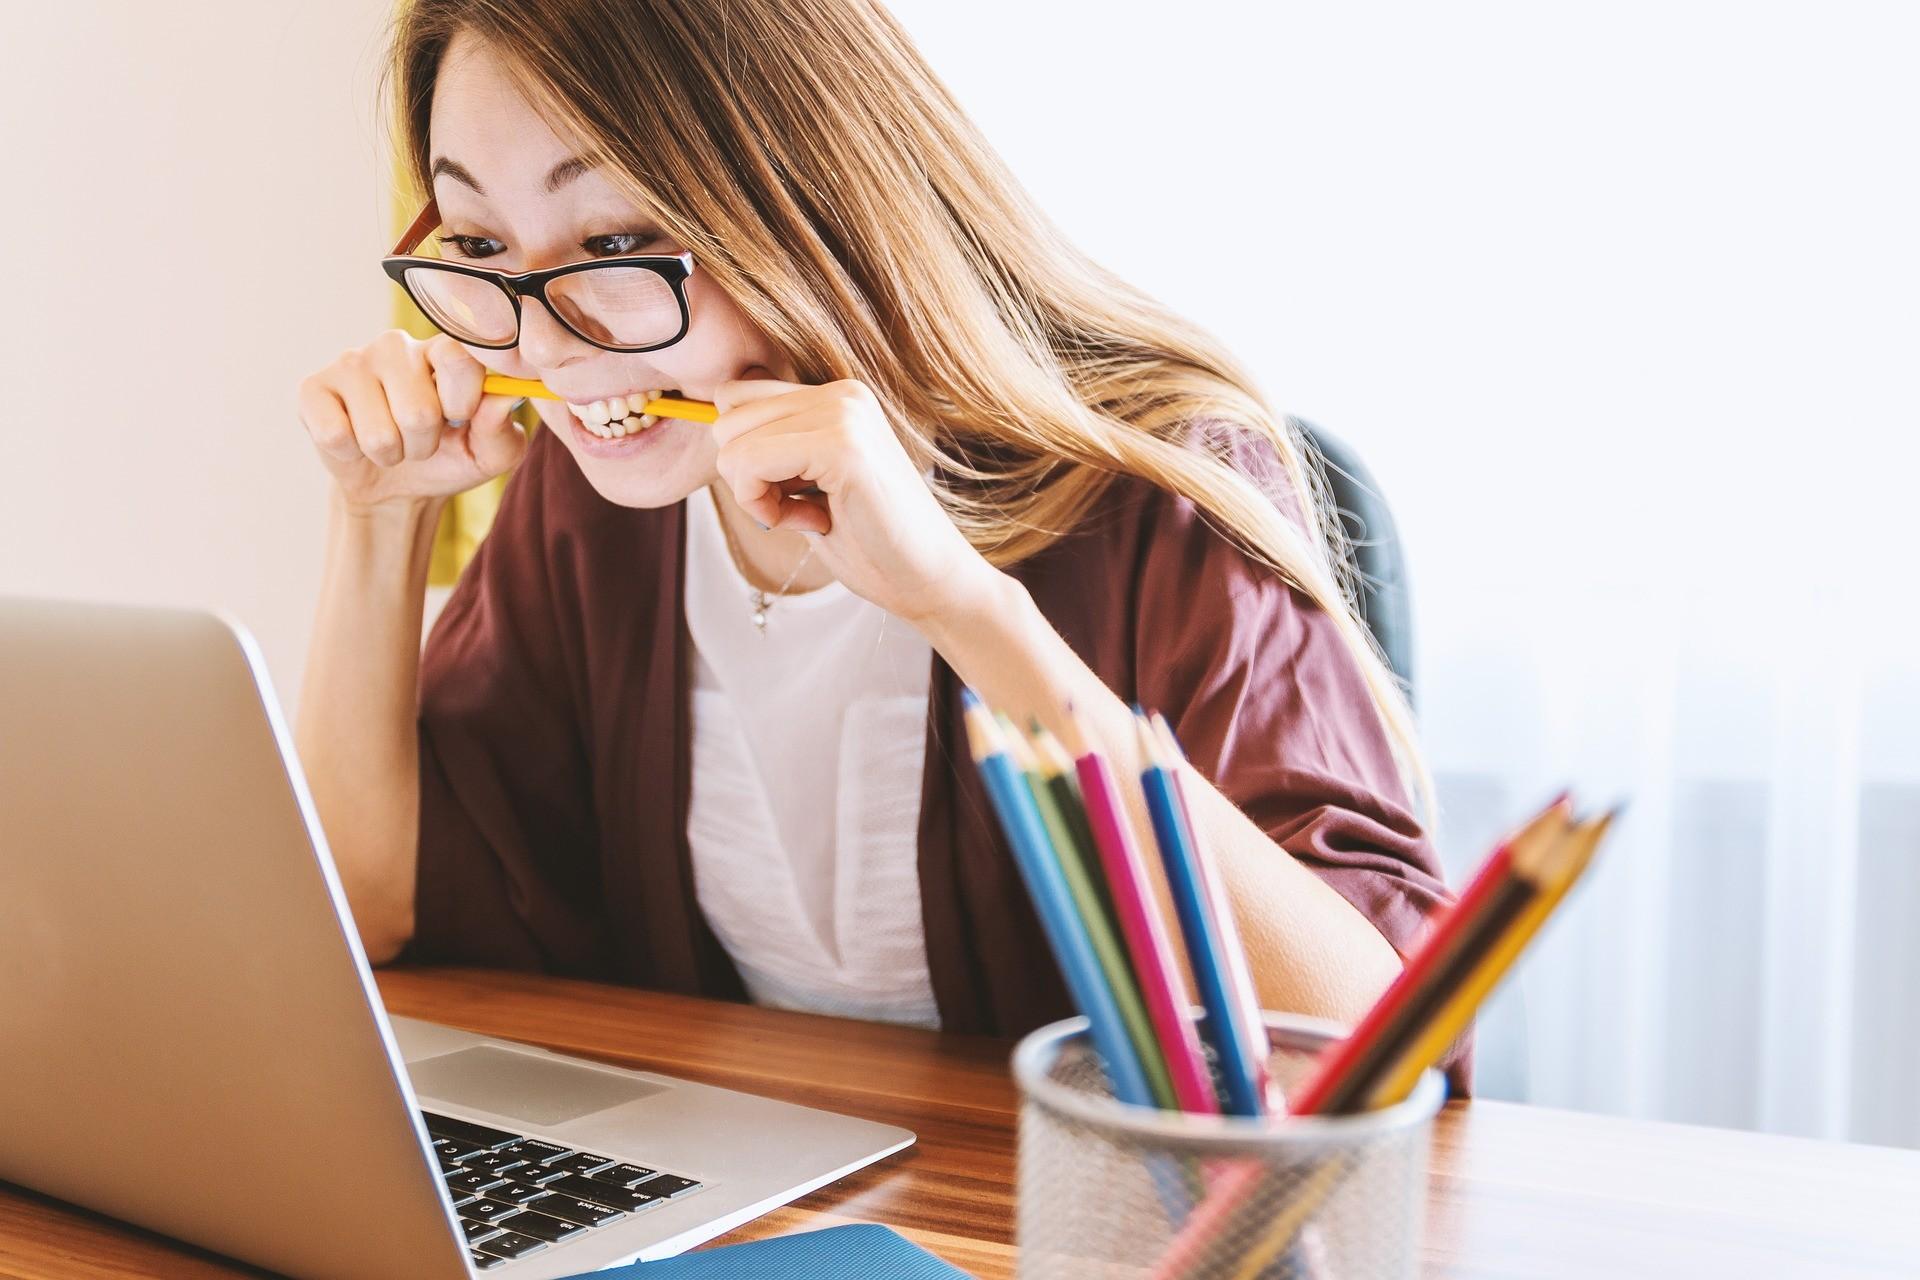 International student checks information online